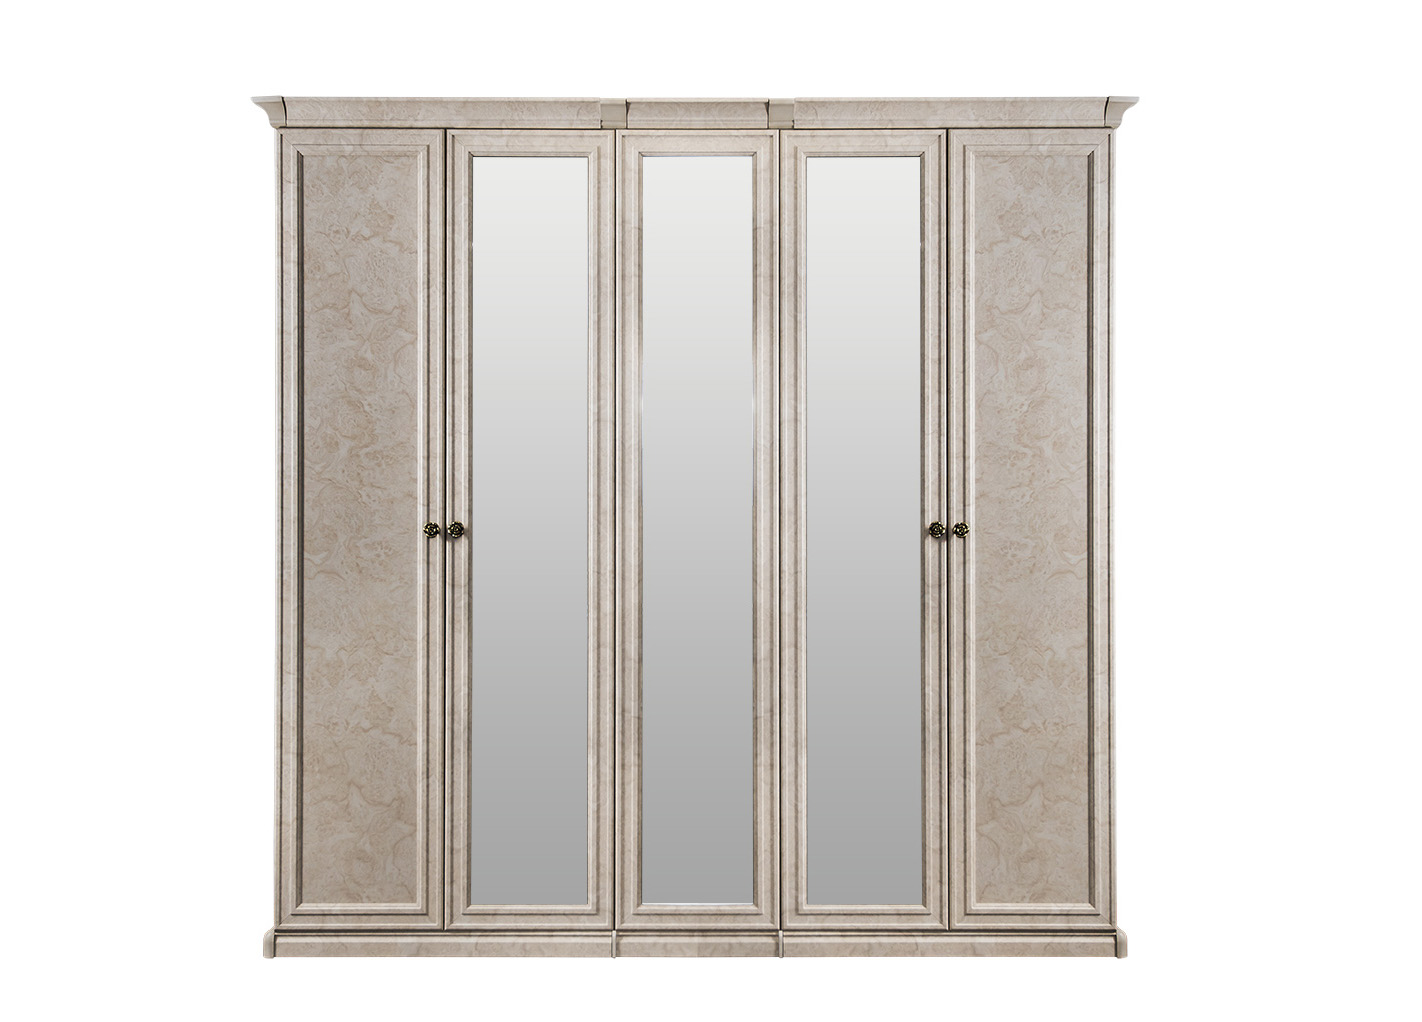 Афина шкаф 5-дверный (2+1+2) с 3 зеркалами